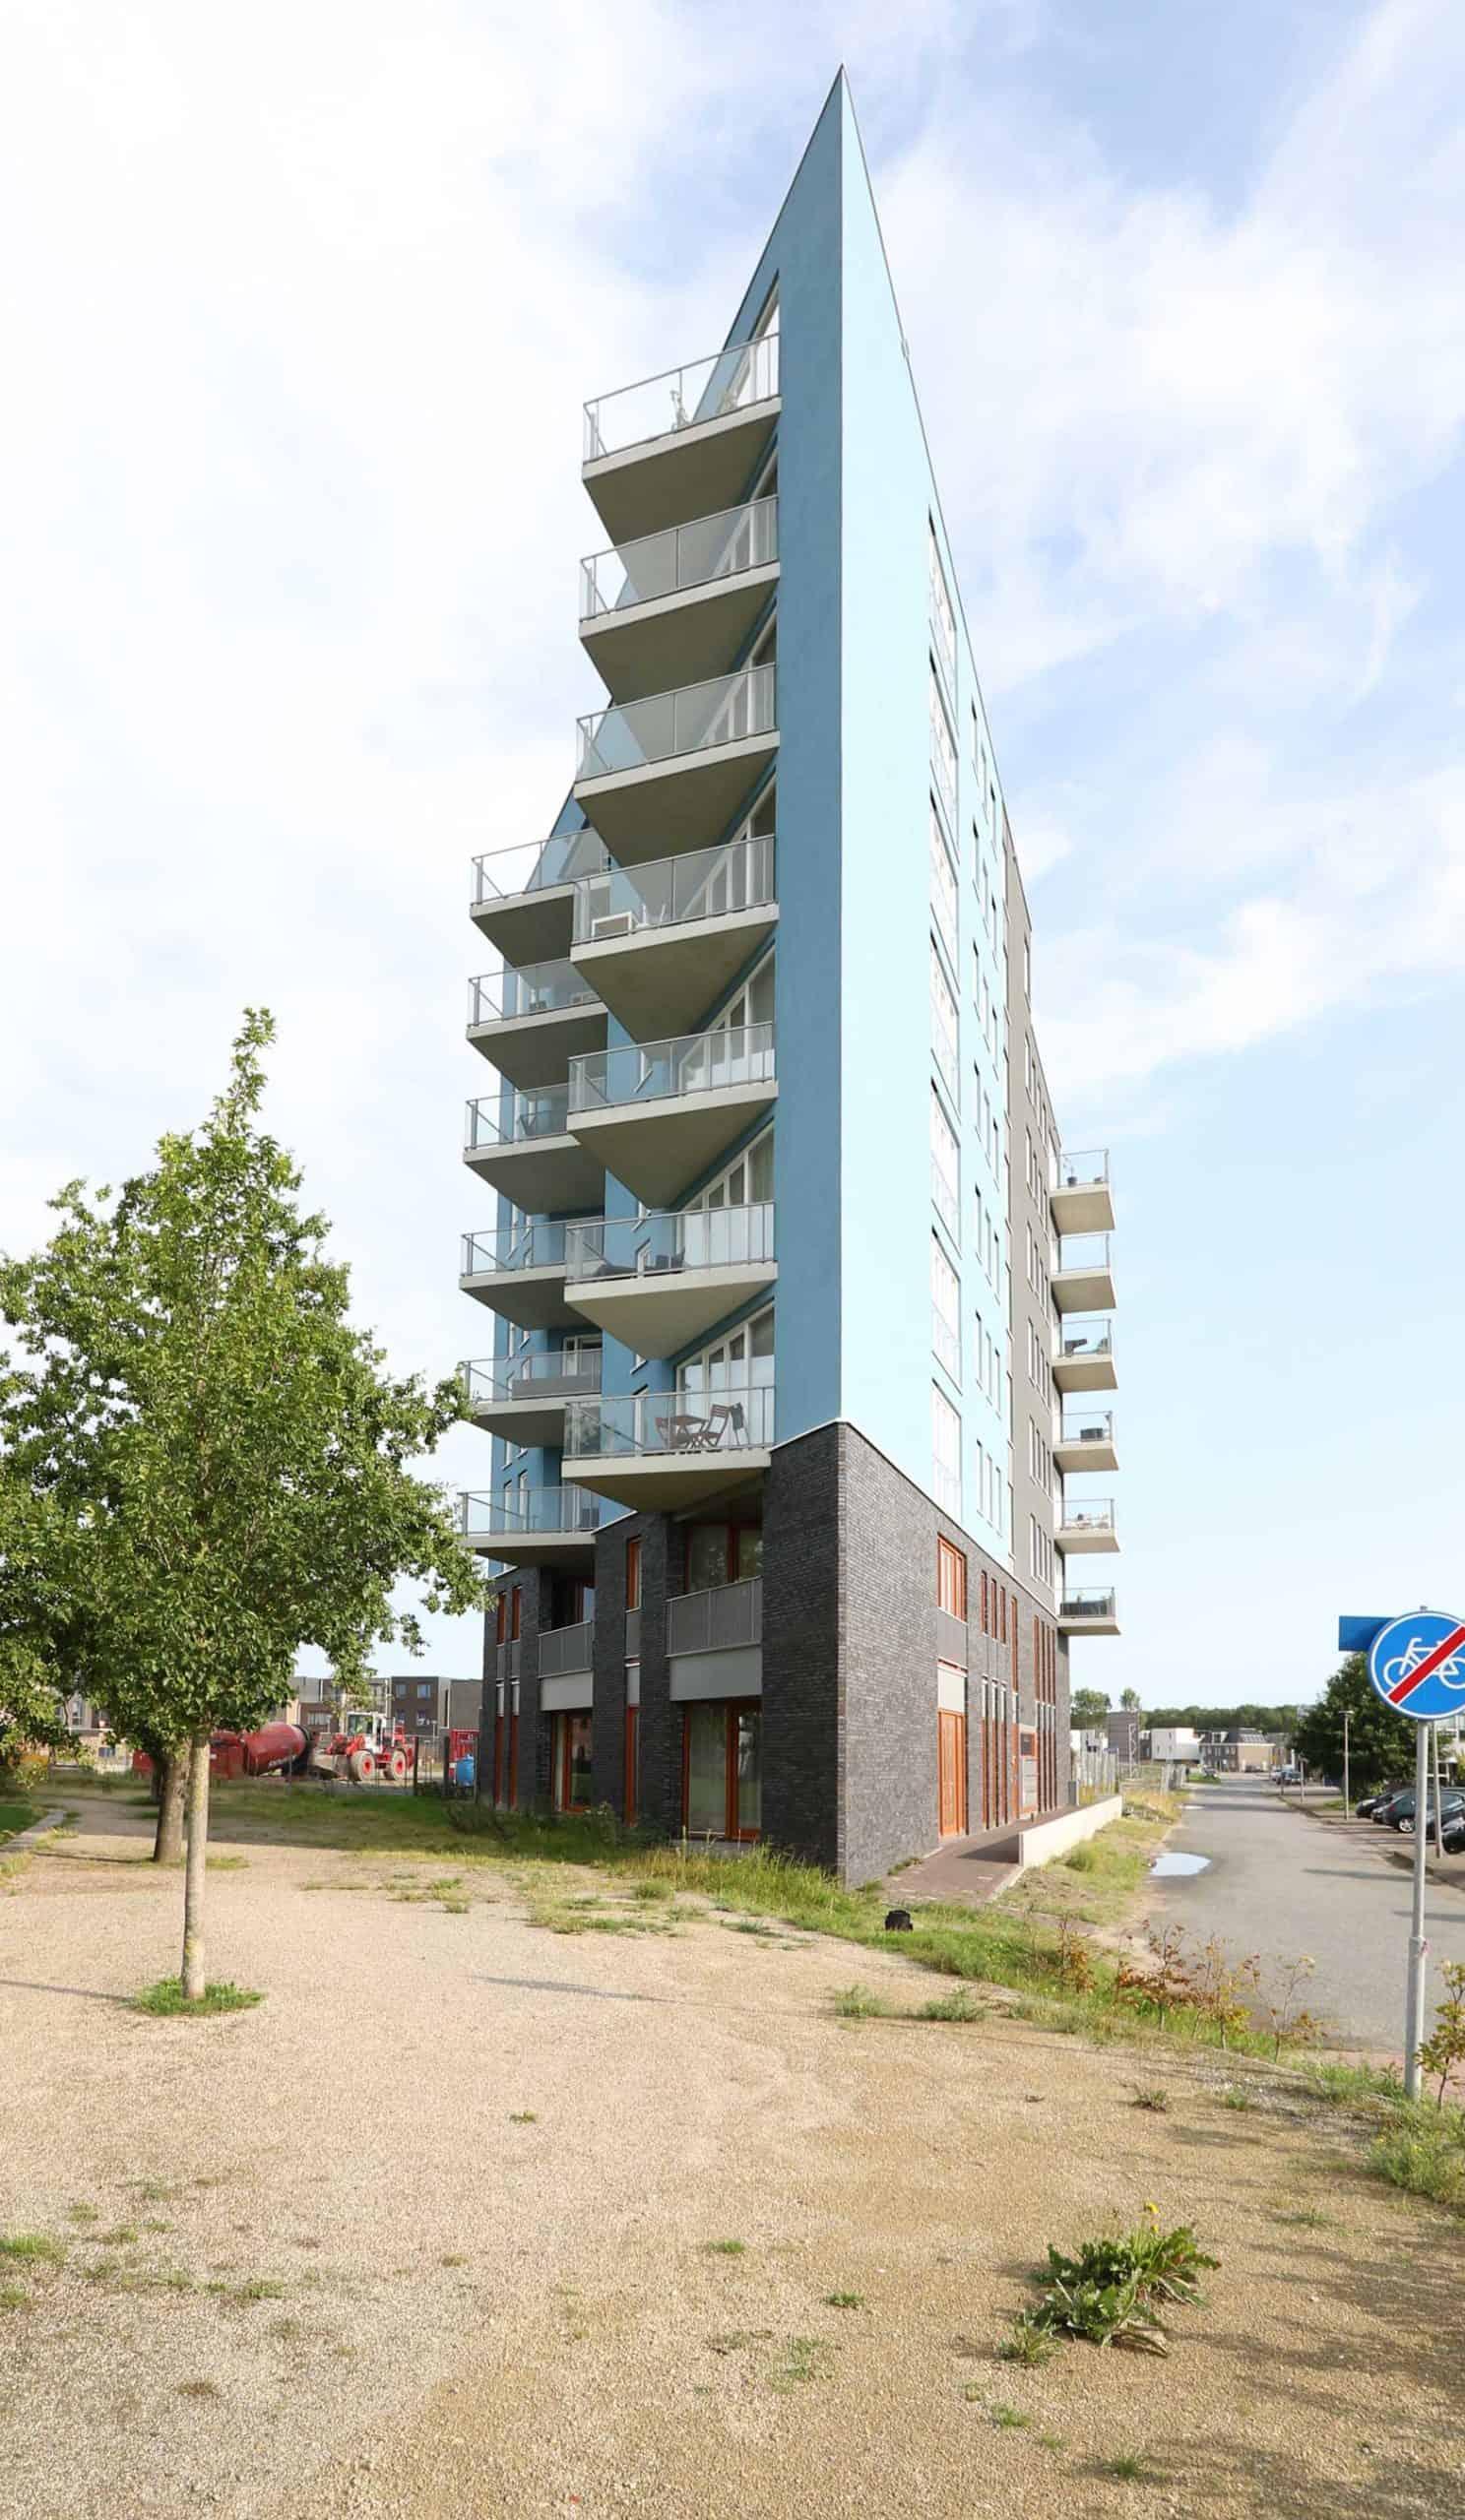 Appartementen complex Homeruspark Almere Poort